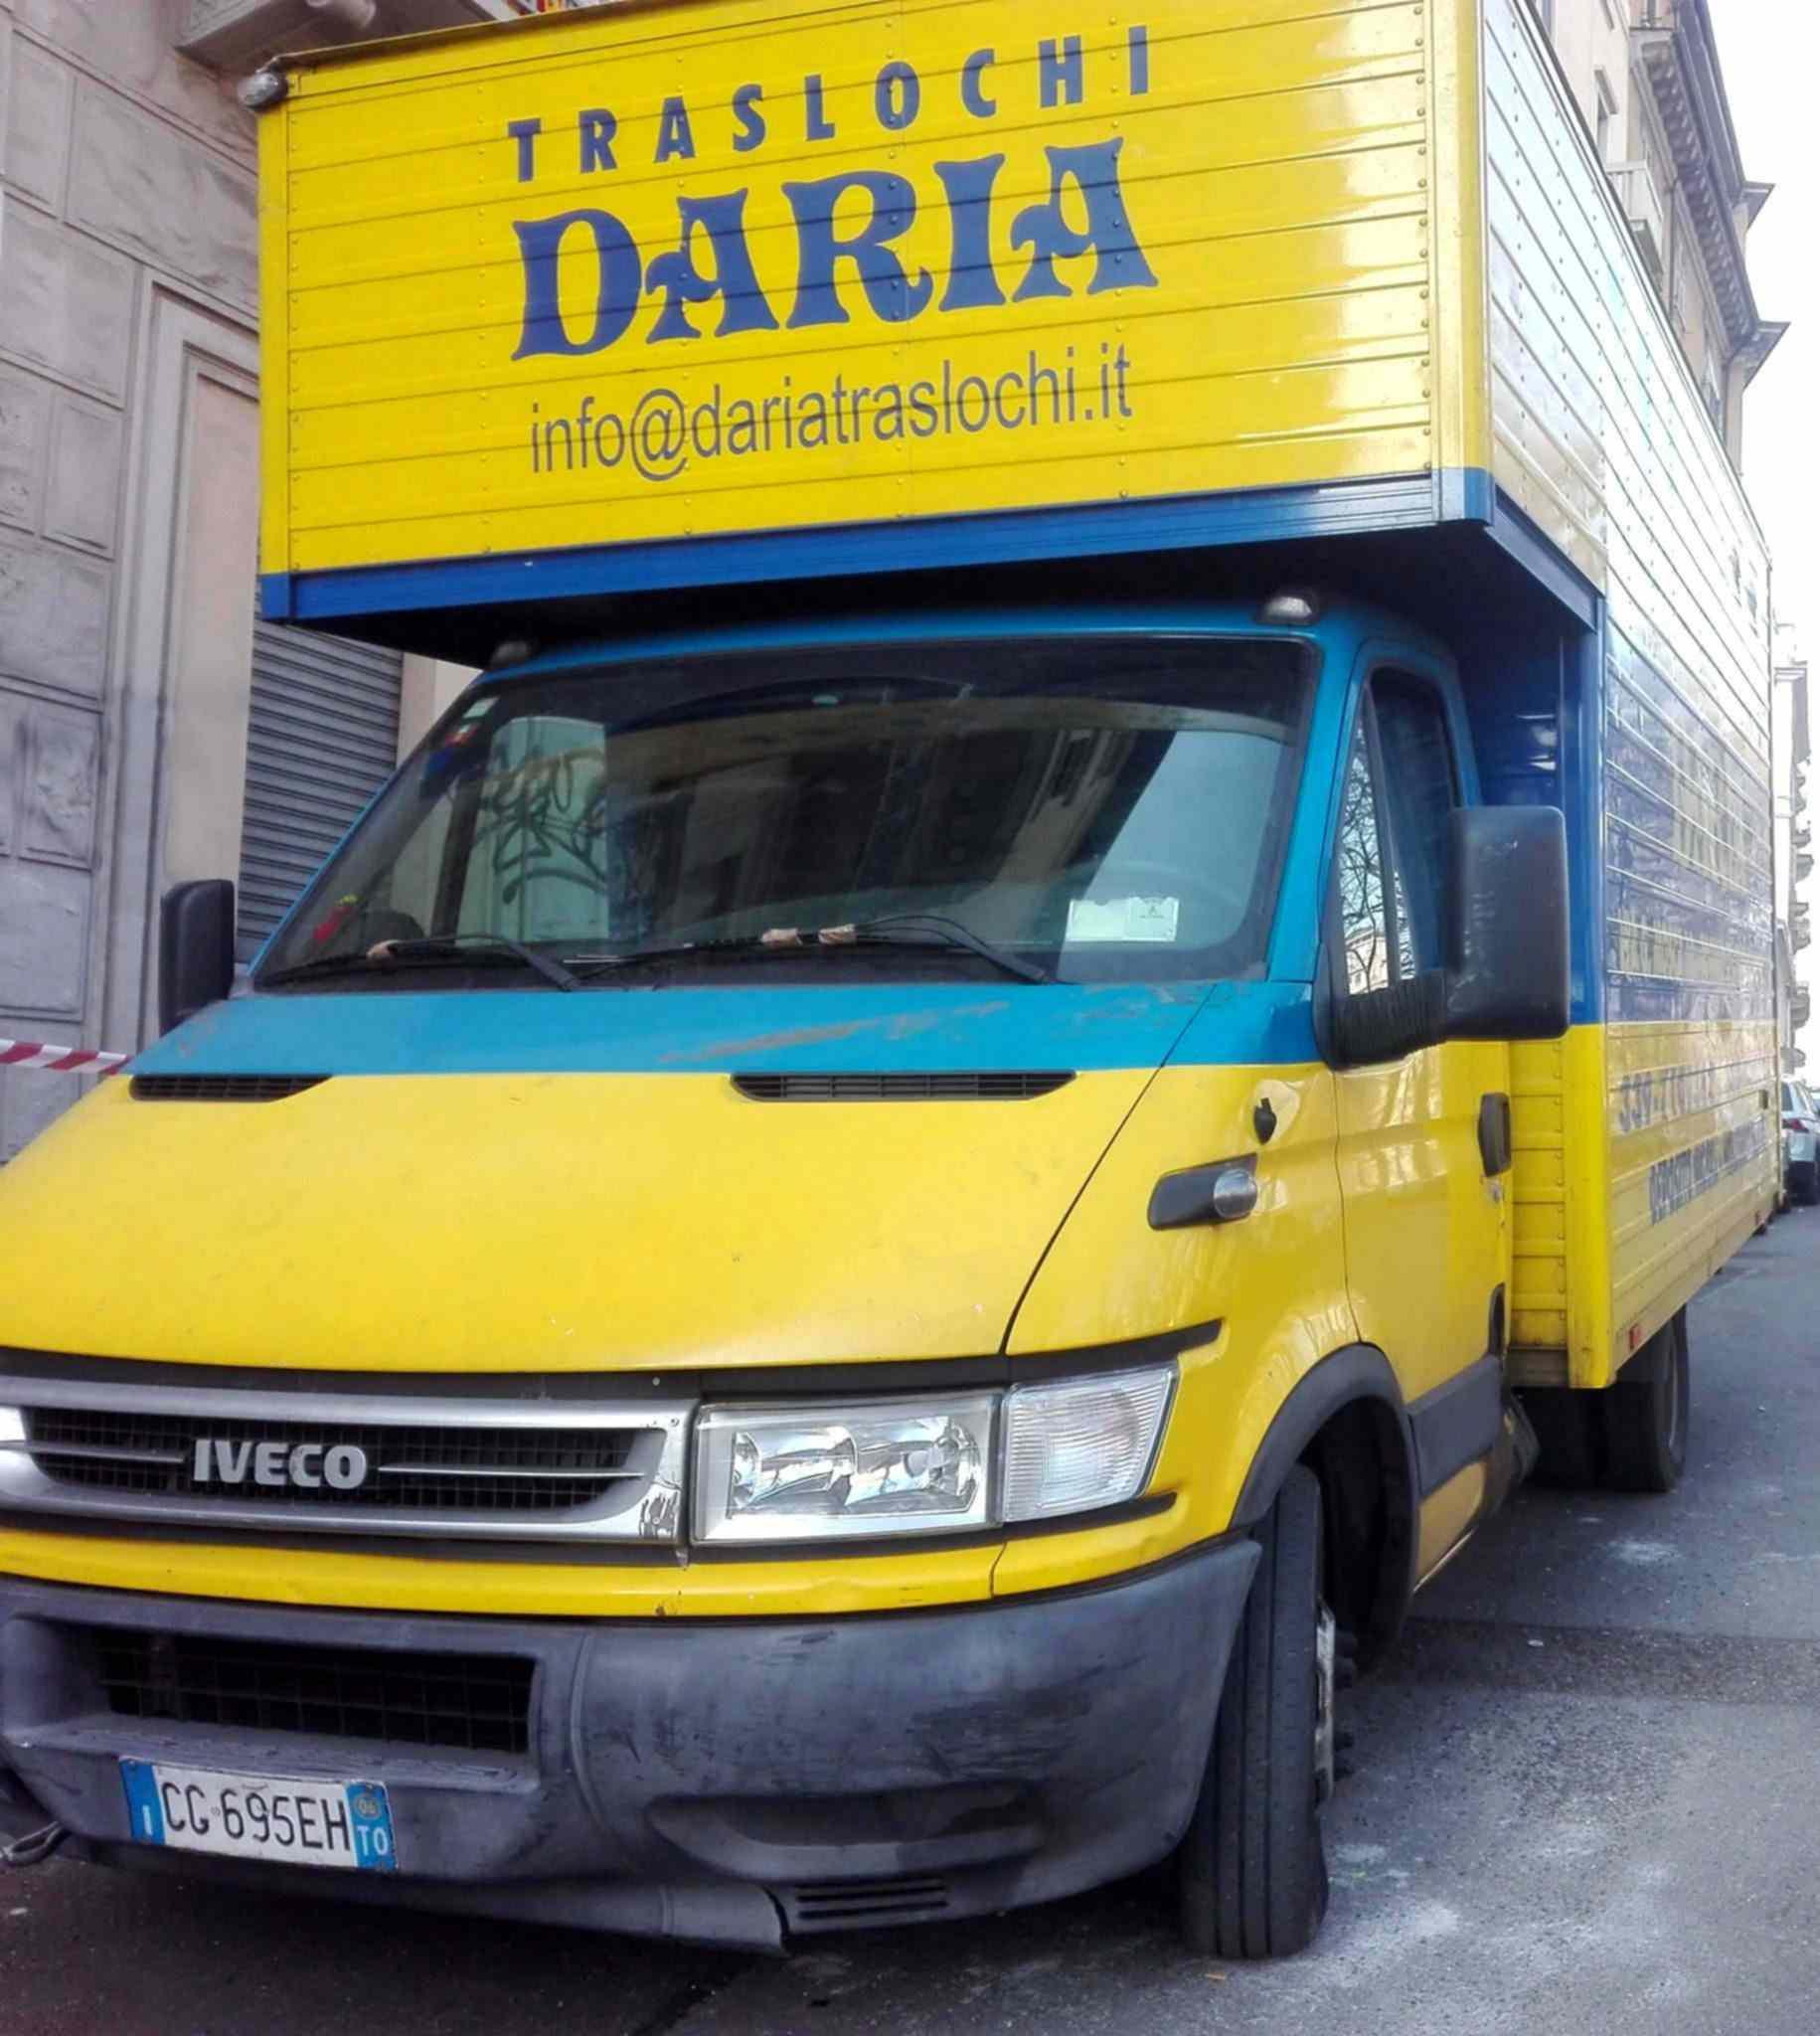 Camion Traslochi a Torino di Daria Traslochi Torino